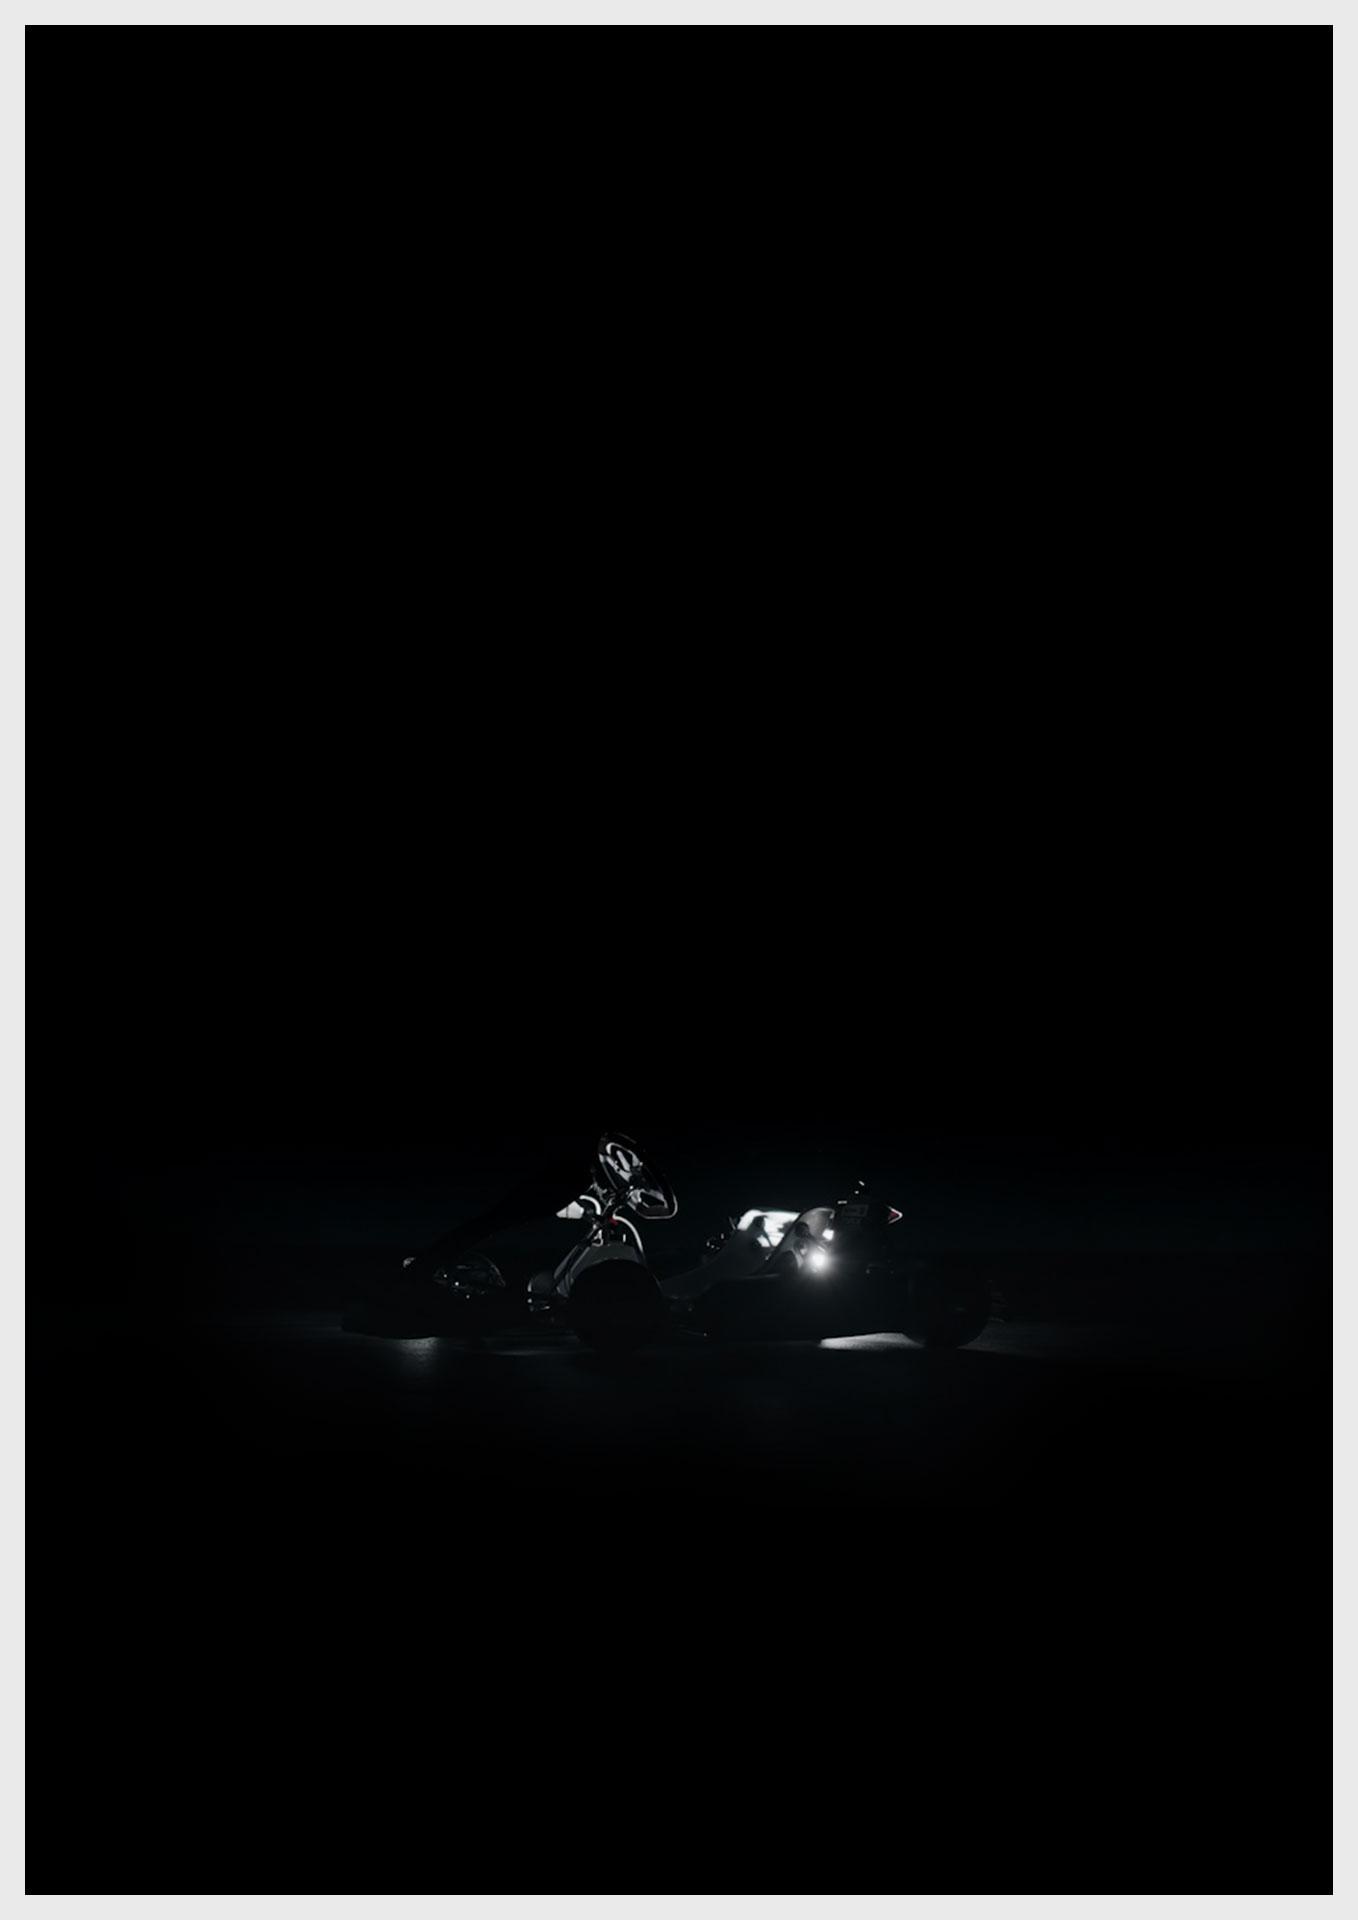 190131_dasblau_Website_ThisIsRotax_Poster